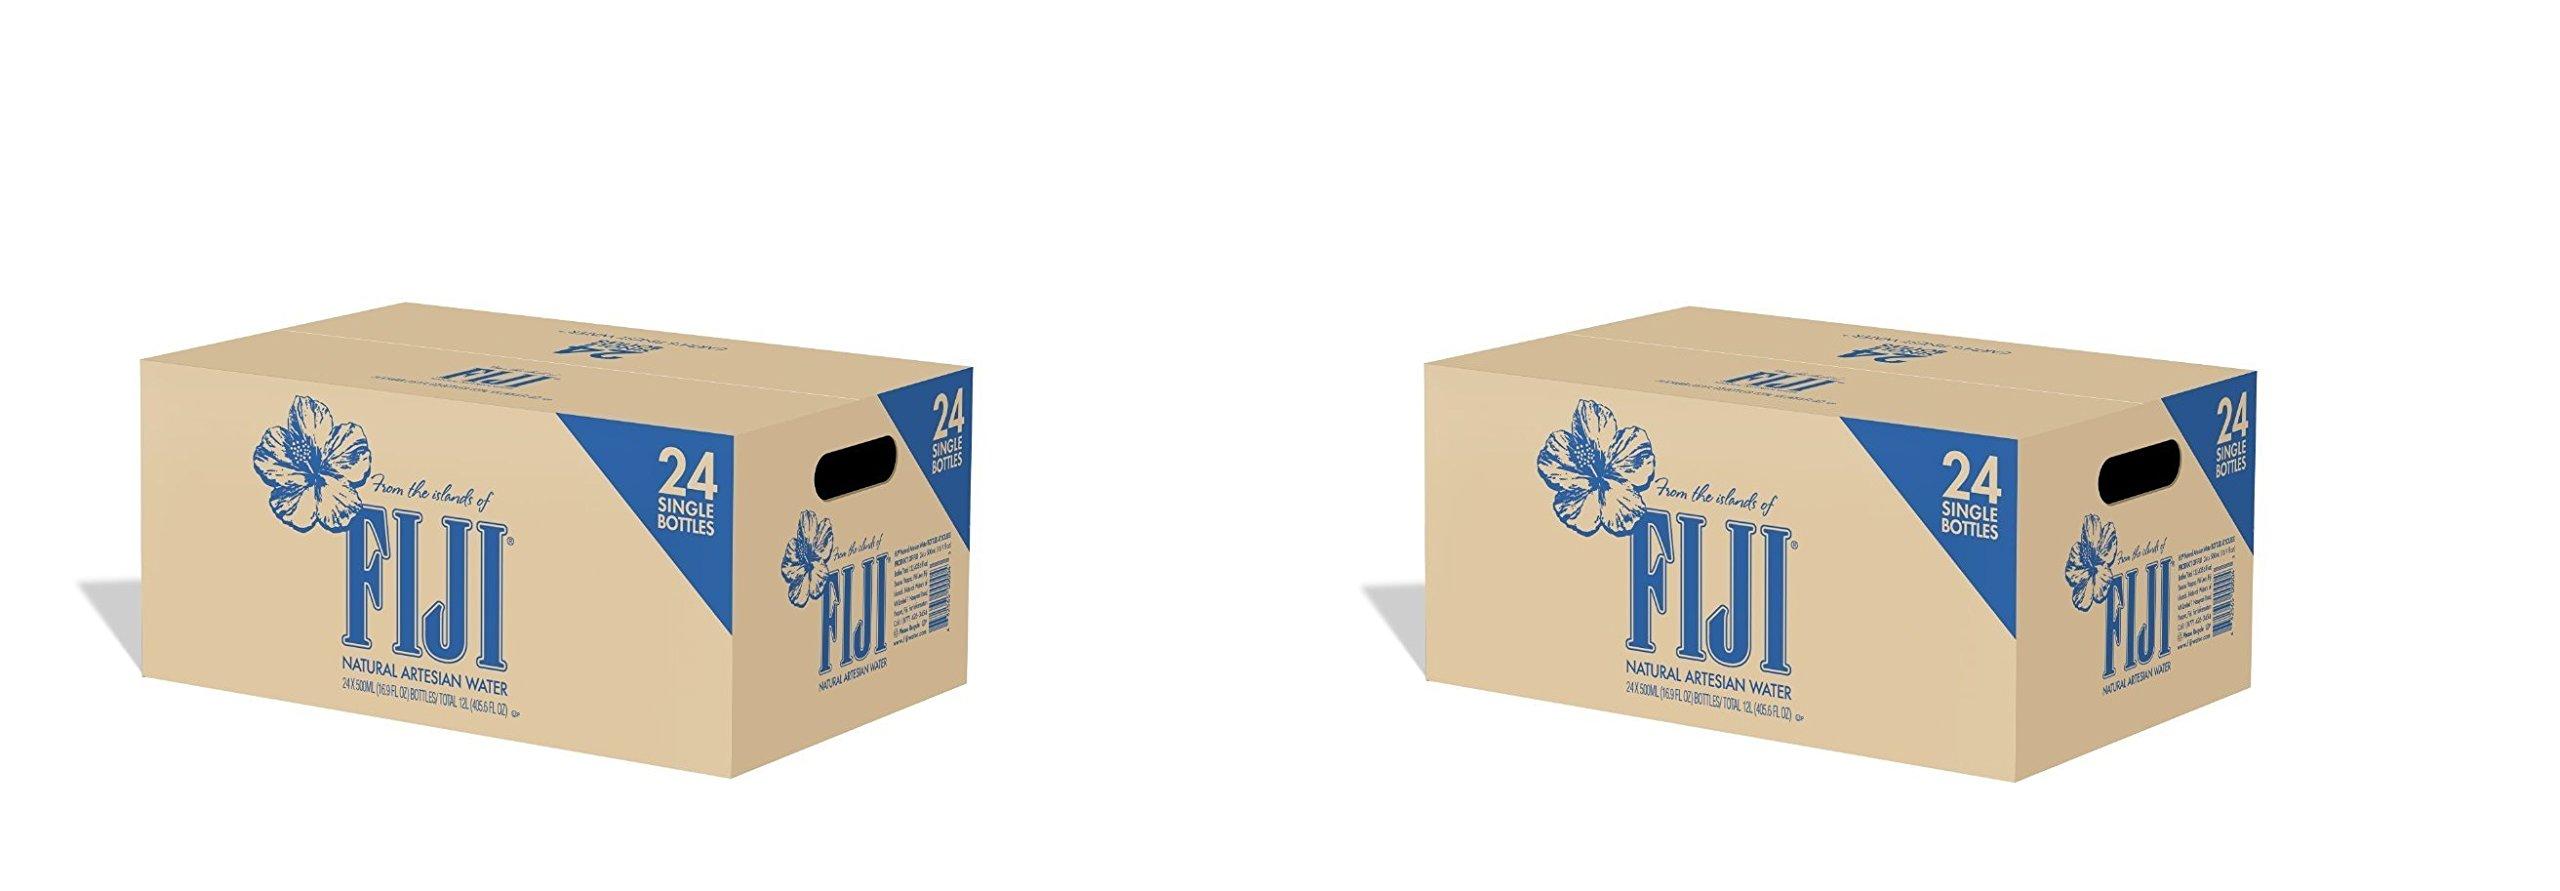 FIJI Natural Artesian Water, 16.9 Fl Oz (Pack of 24 Bottles (.2 Caes)